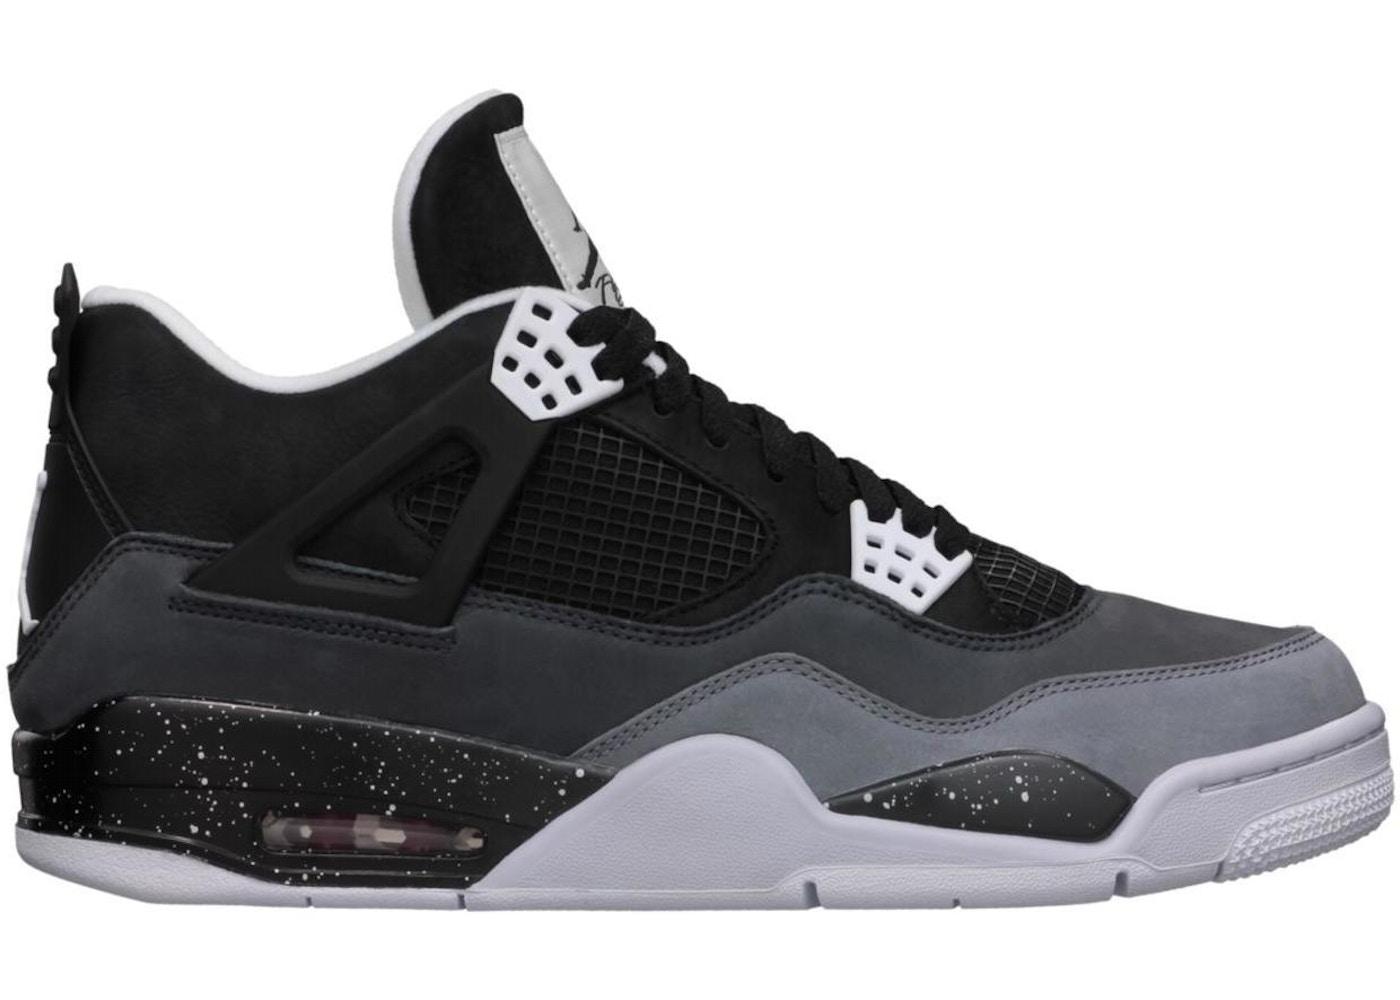 brand new 2b1d4 081db Jordan 4 Retro Fear Pack - 626969-030